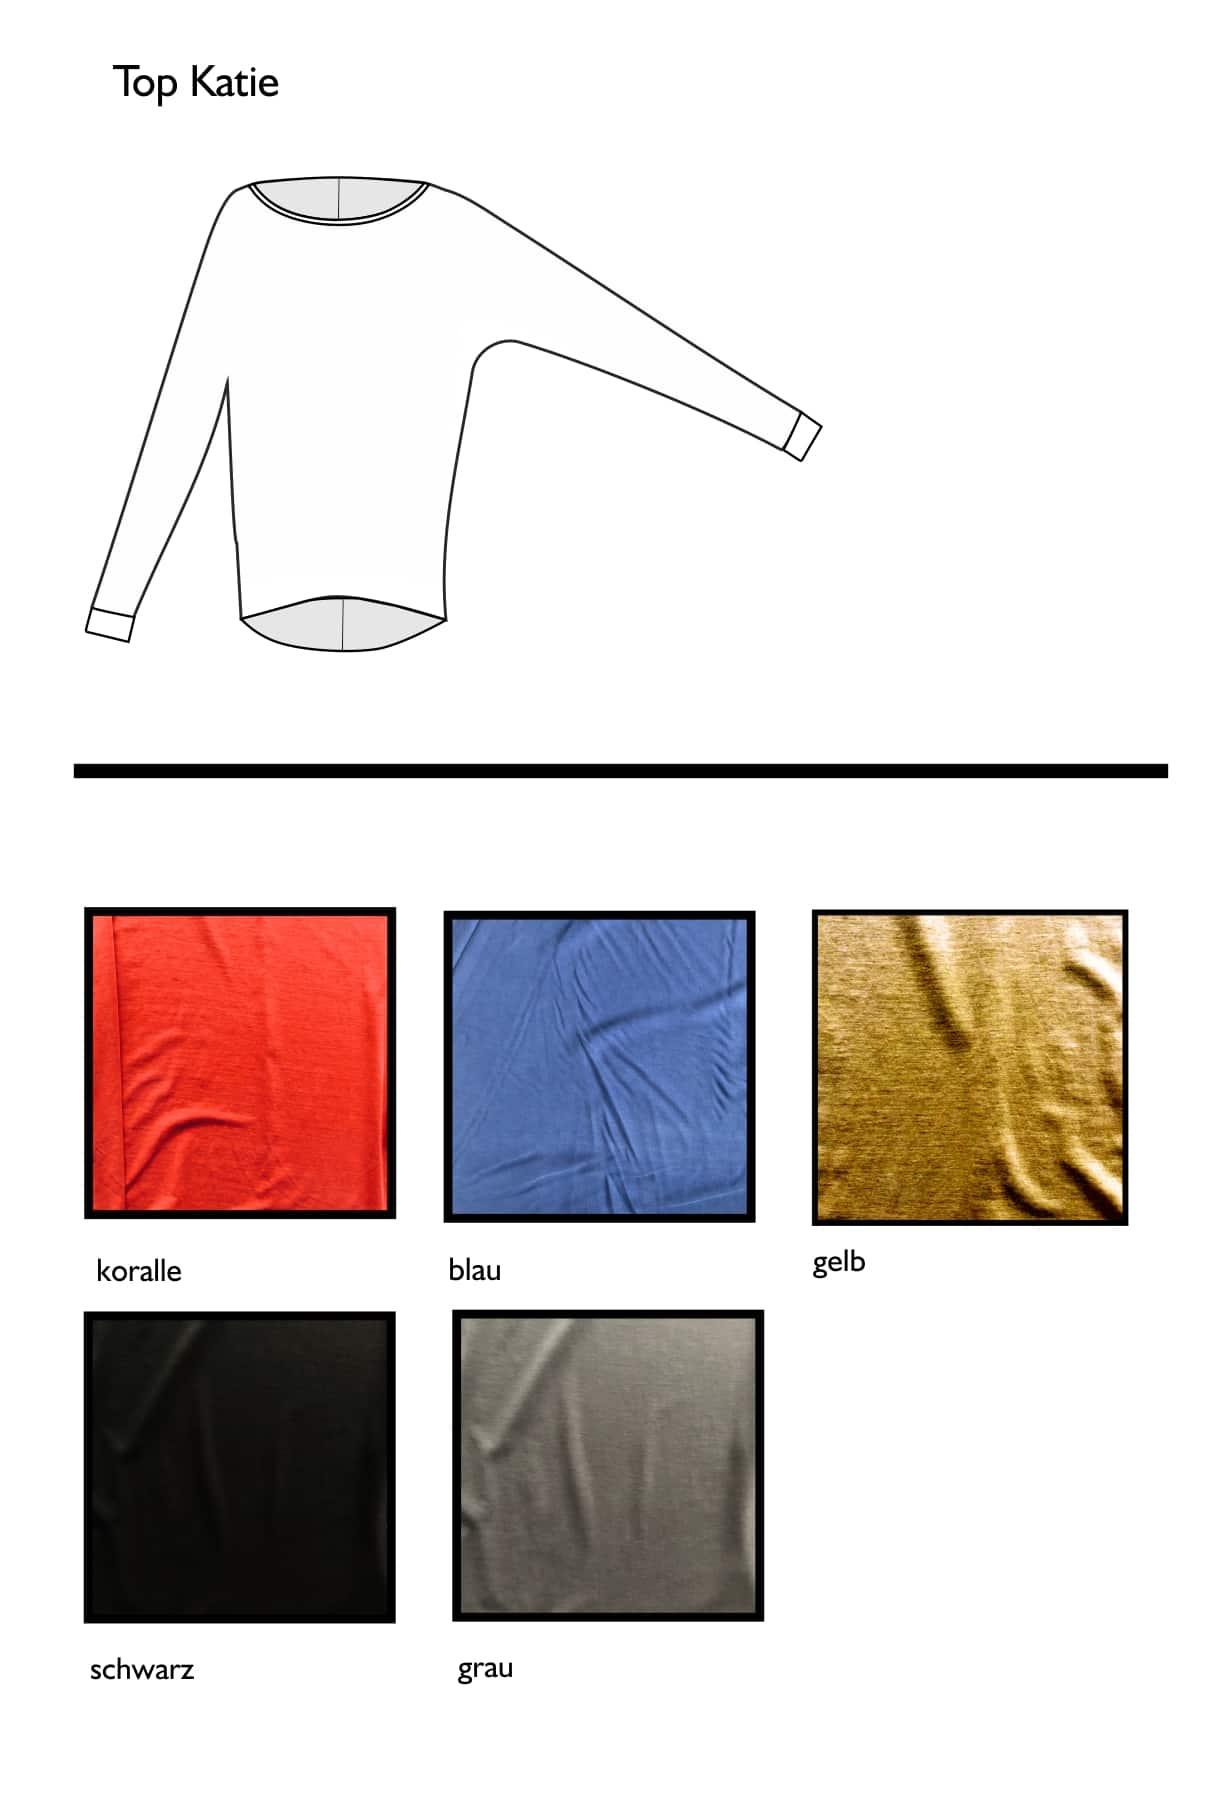 top katie modal farben